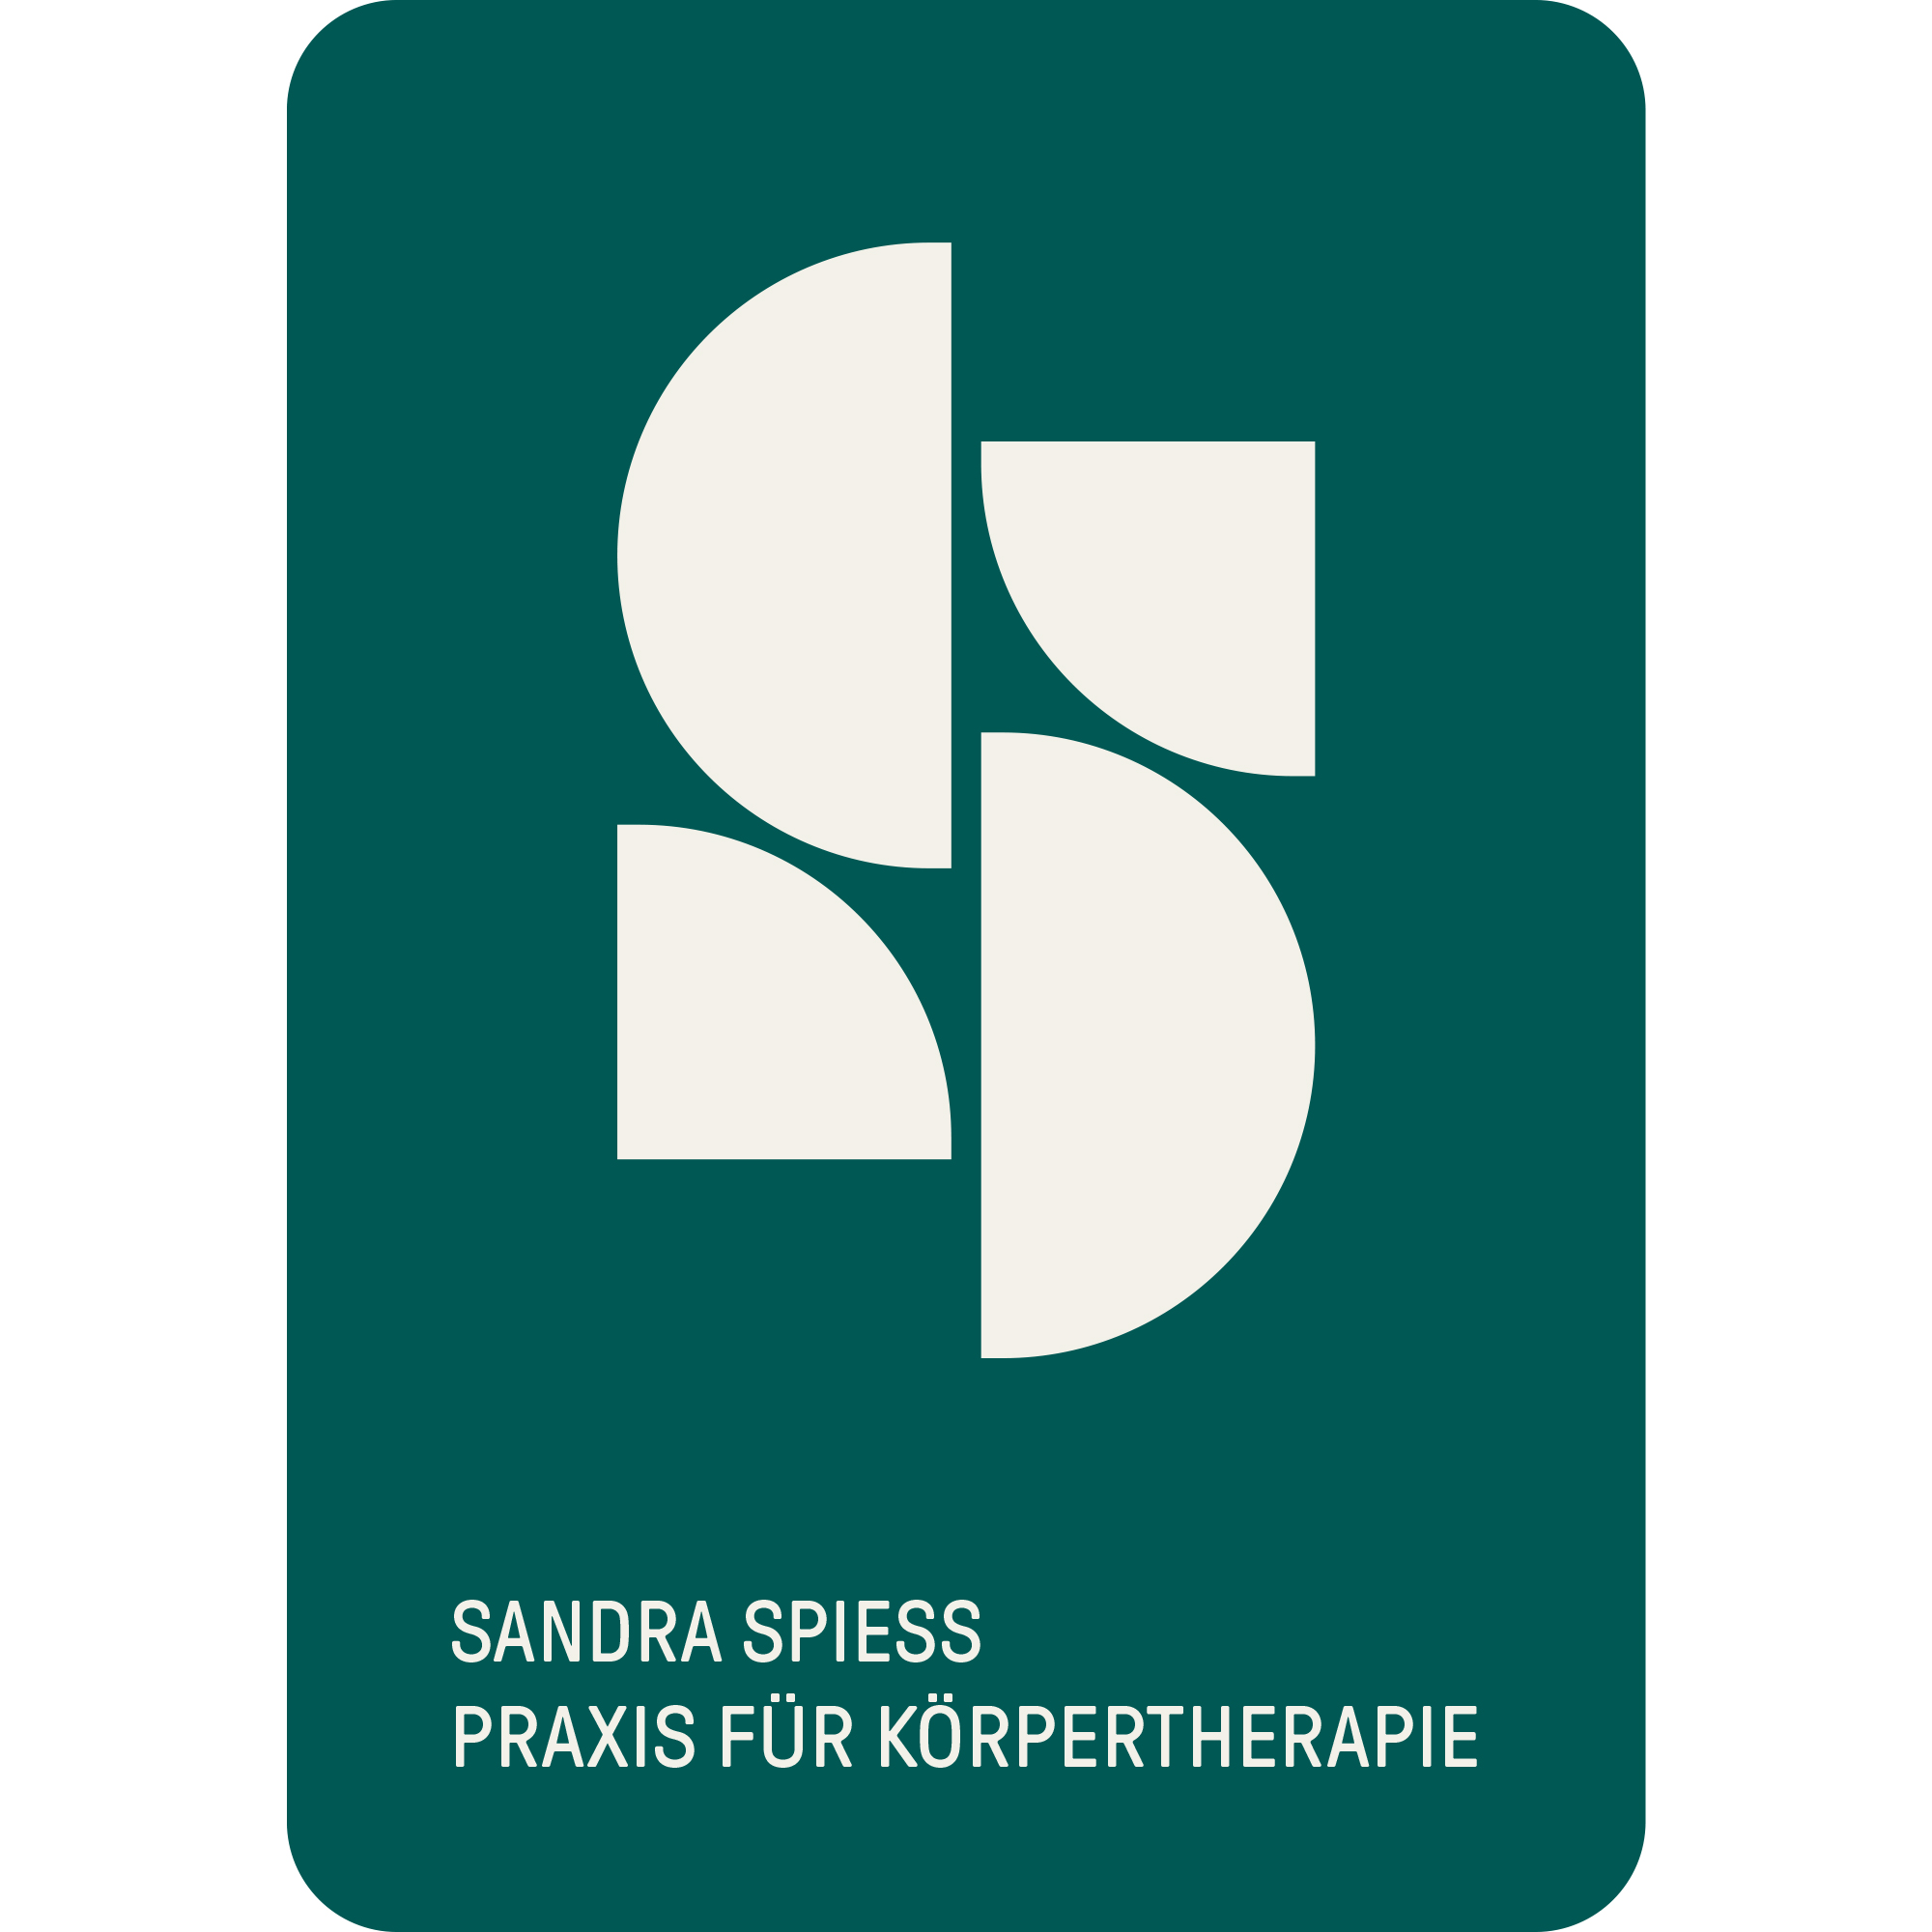 Sandra Spiess, Praxis für Körpertherapie / Bern / 2021